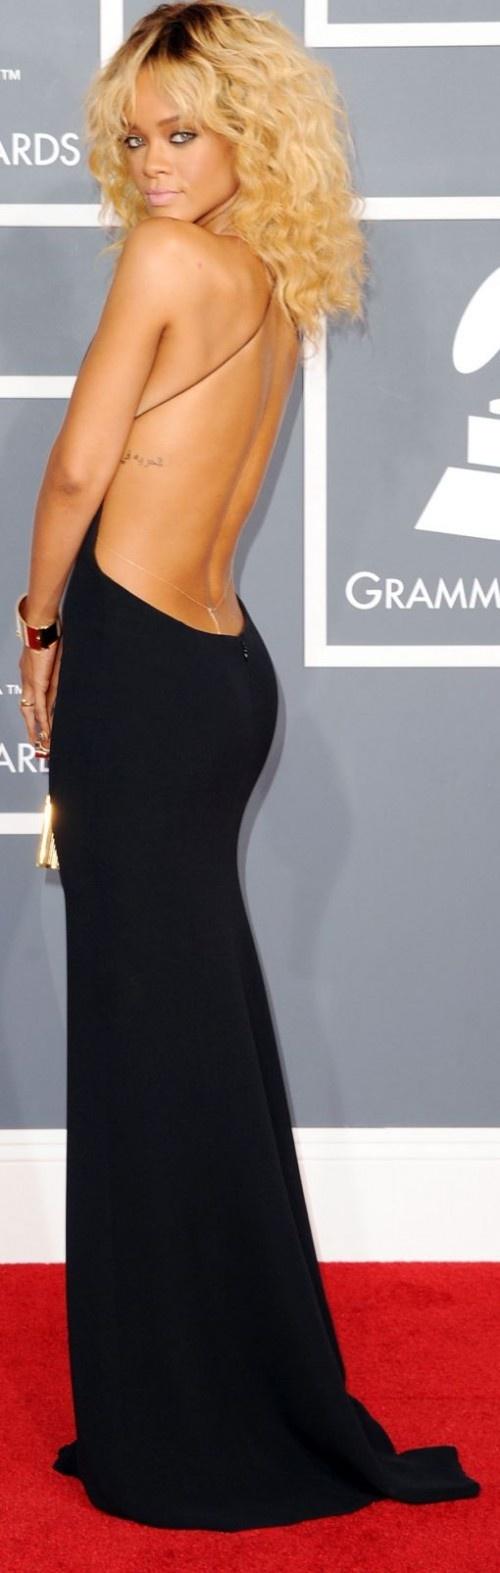 Bringing sexy back fashion pinterest sexy rihanna and